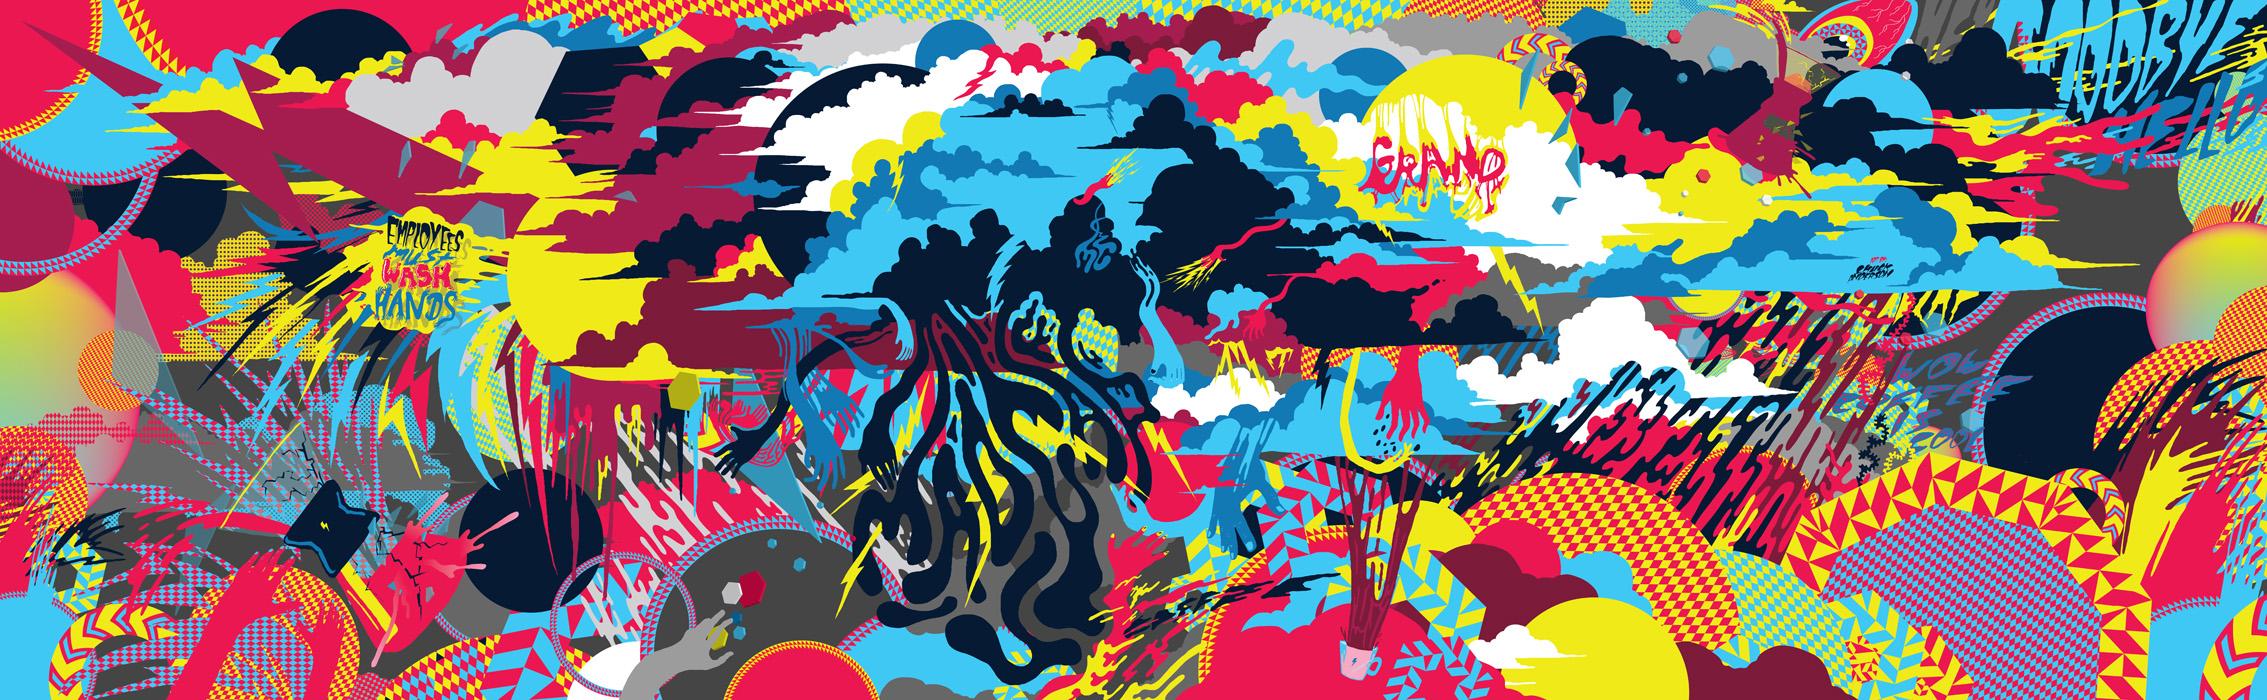 nopattern studio chuck anderson chicago based art design